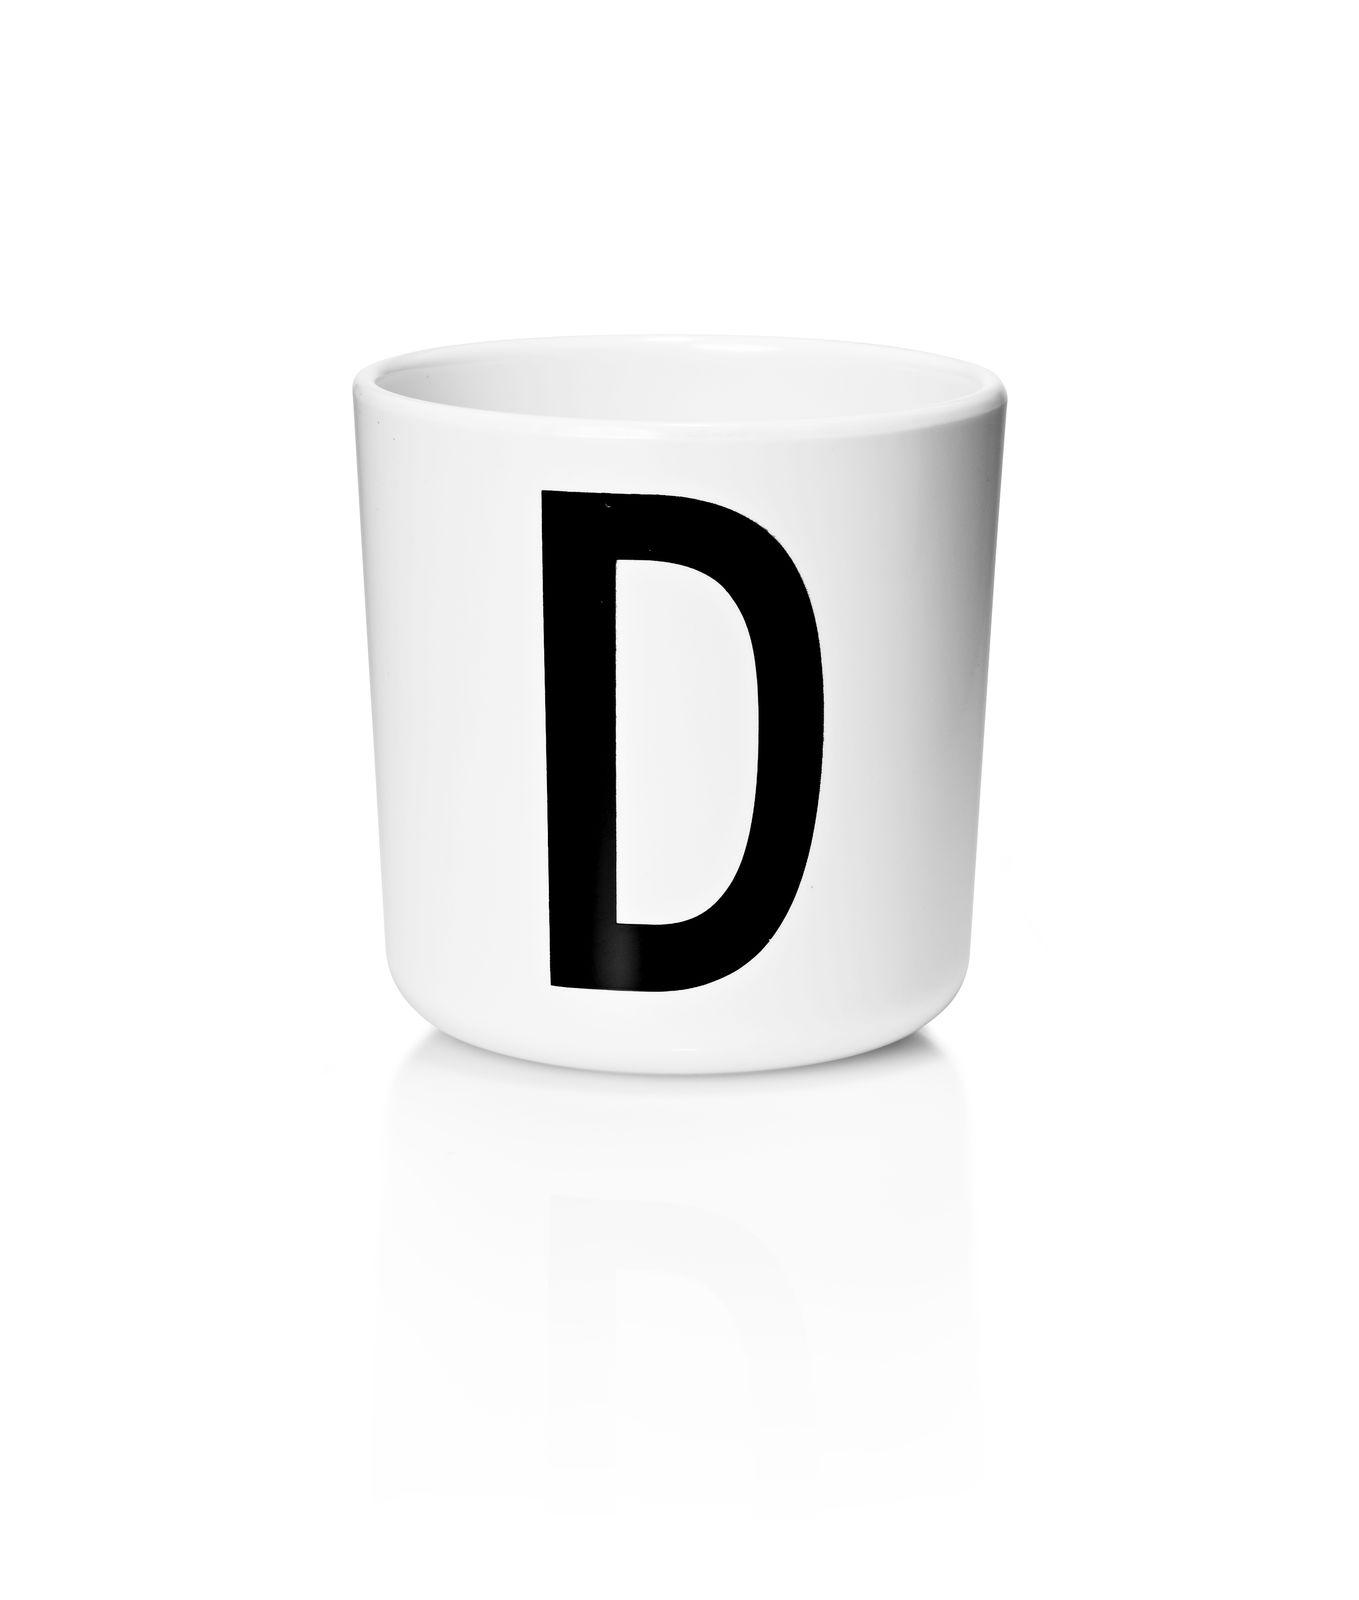 Design Letters - Personal Melamine Cup D - White (20201000D)